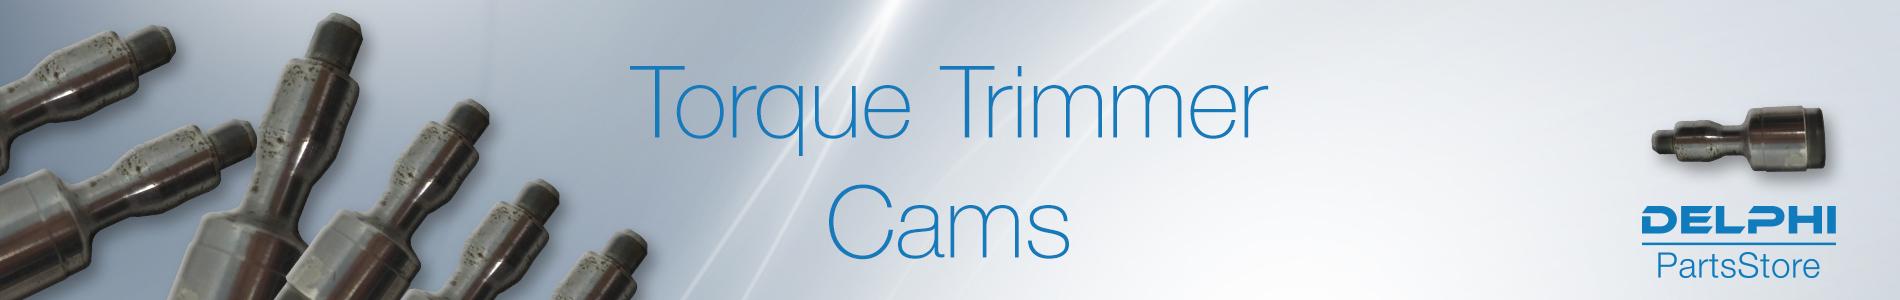 Torque Trimmer Cams